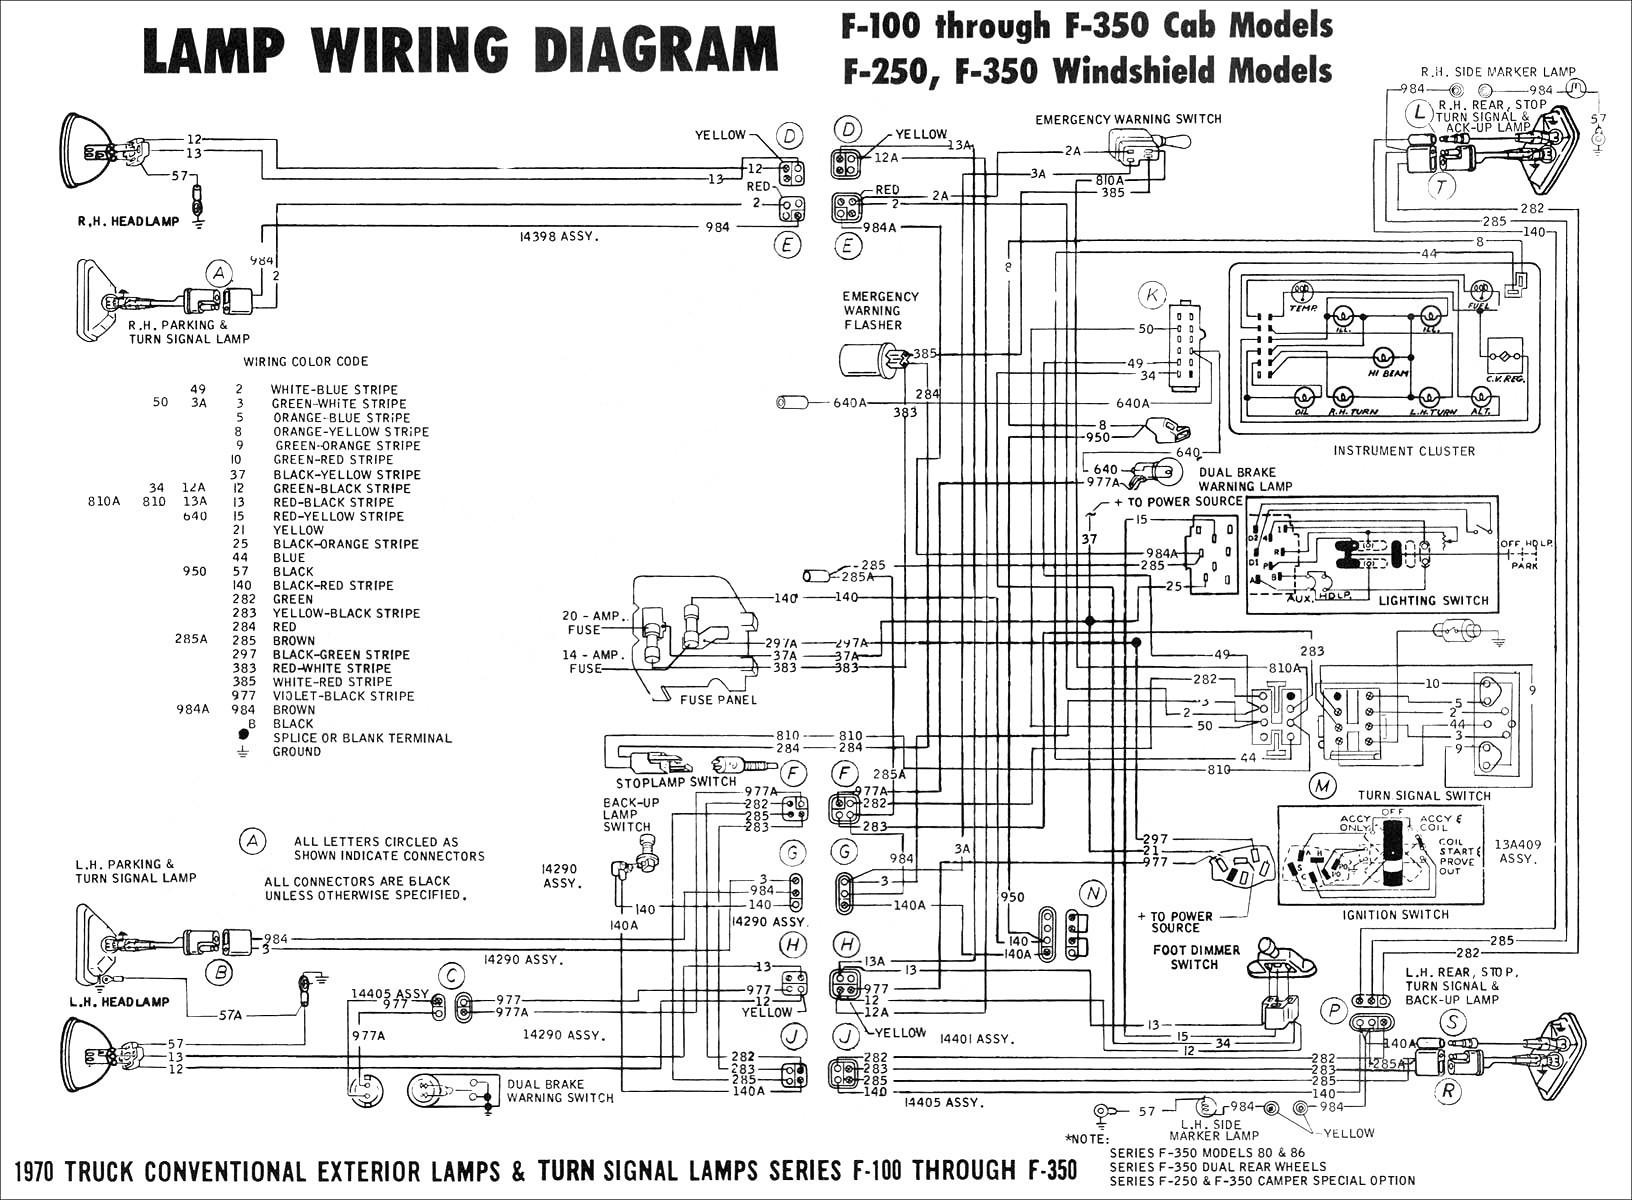 Honda Rebel 250 Wiring Diagram 1989 Rinker Wiring Diagram Data Schematics Wiring Diagram • Of Honda Rebel 250 Wiring Diagram